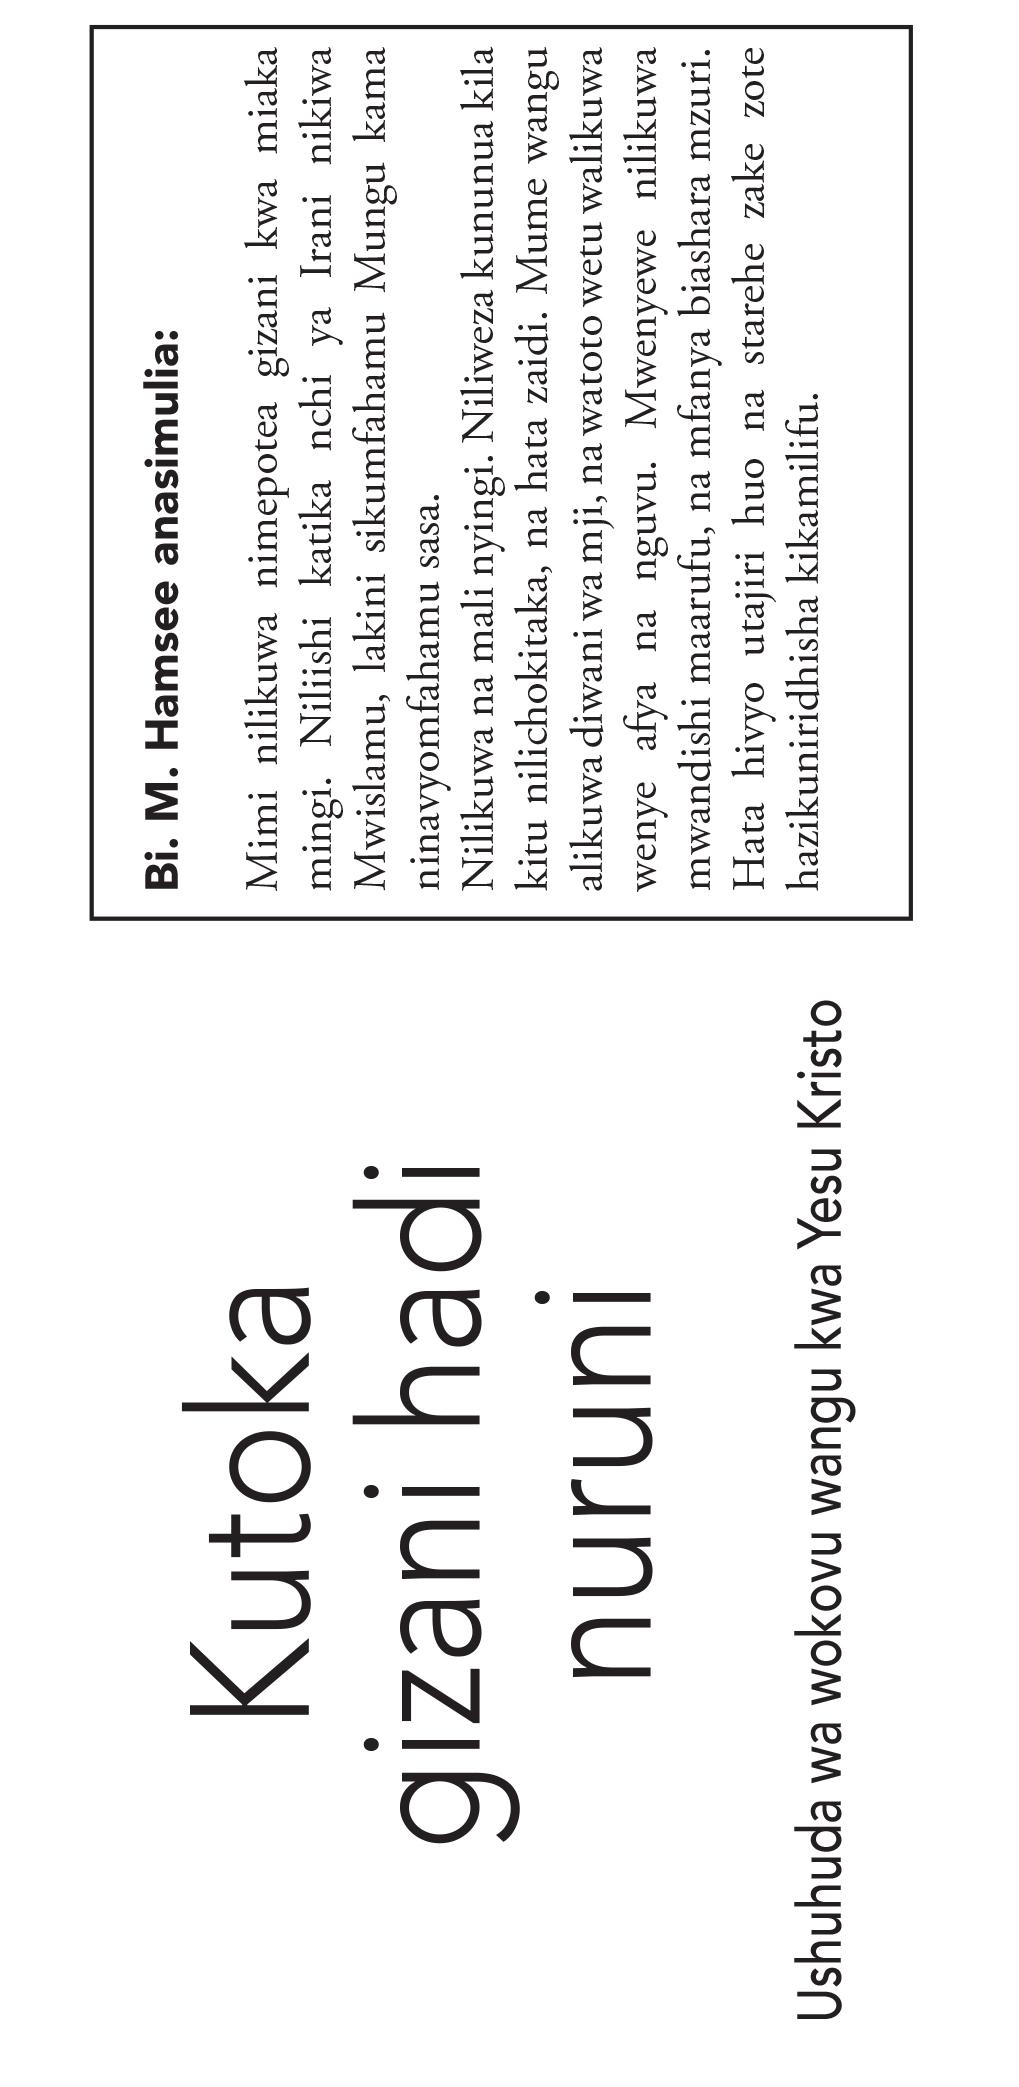 Kutoka gizani 25.5 x 18.5 final print-1.jpg